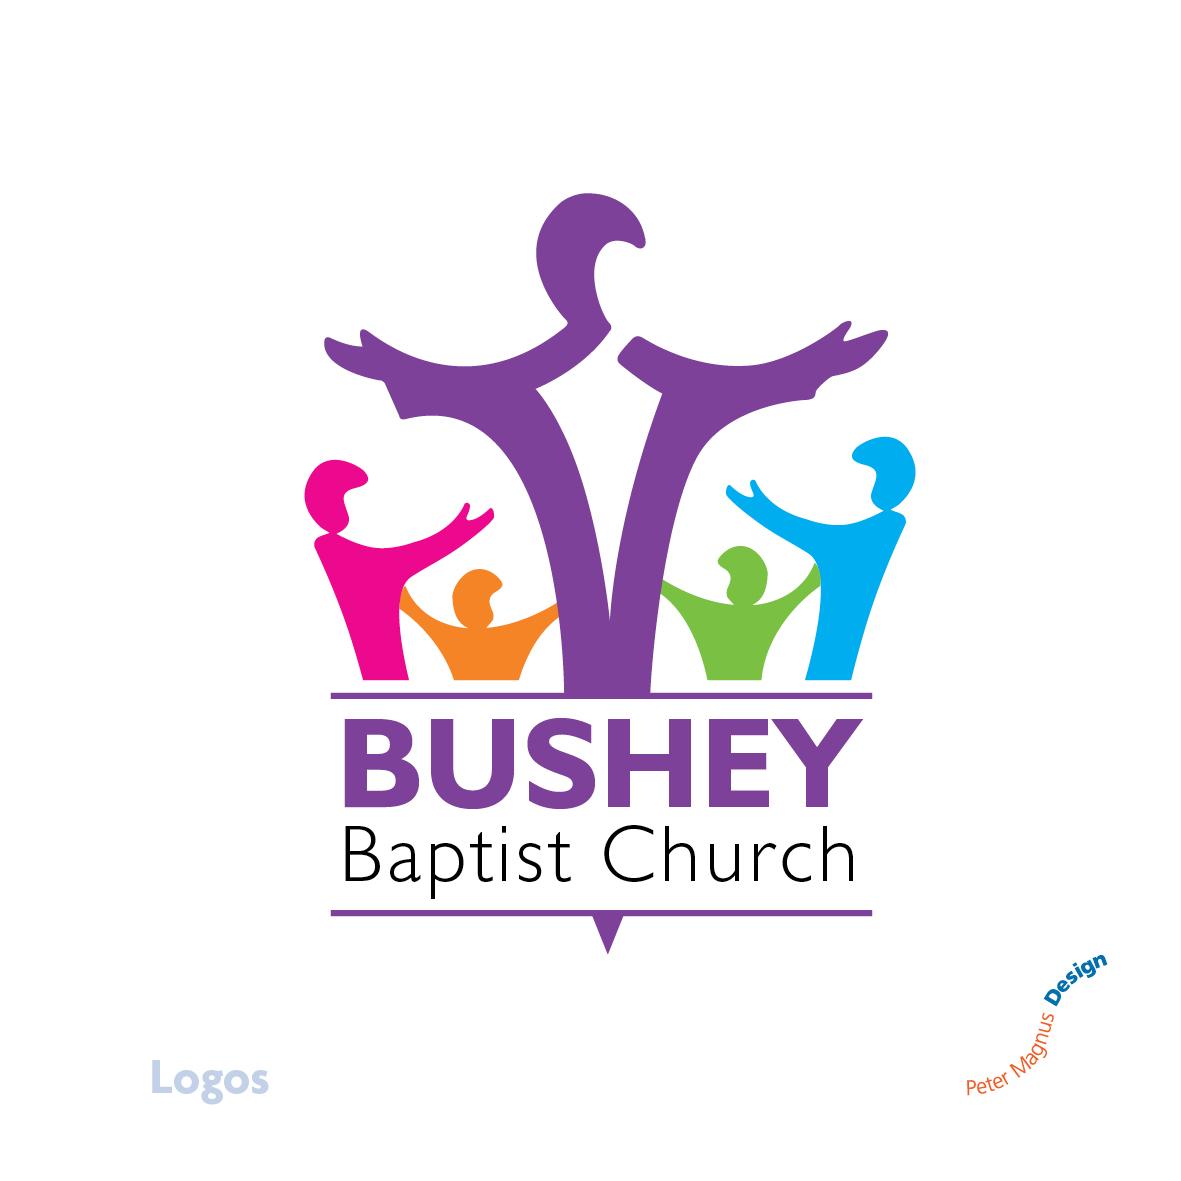 Bushey Baptist Church logo